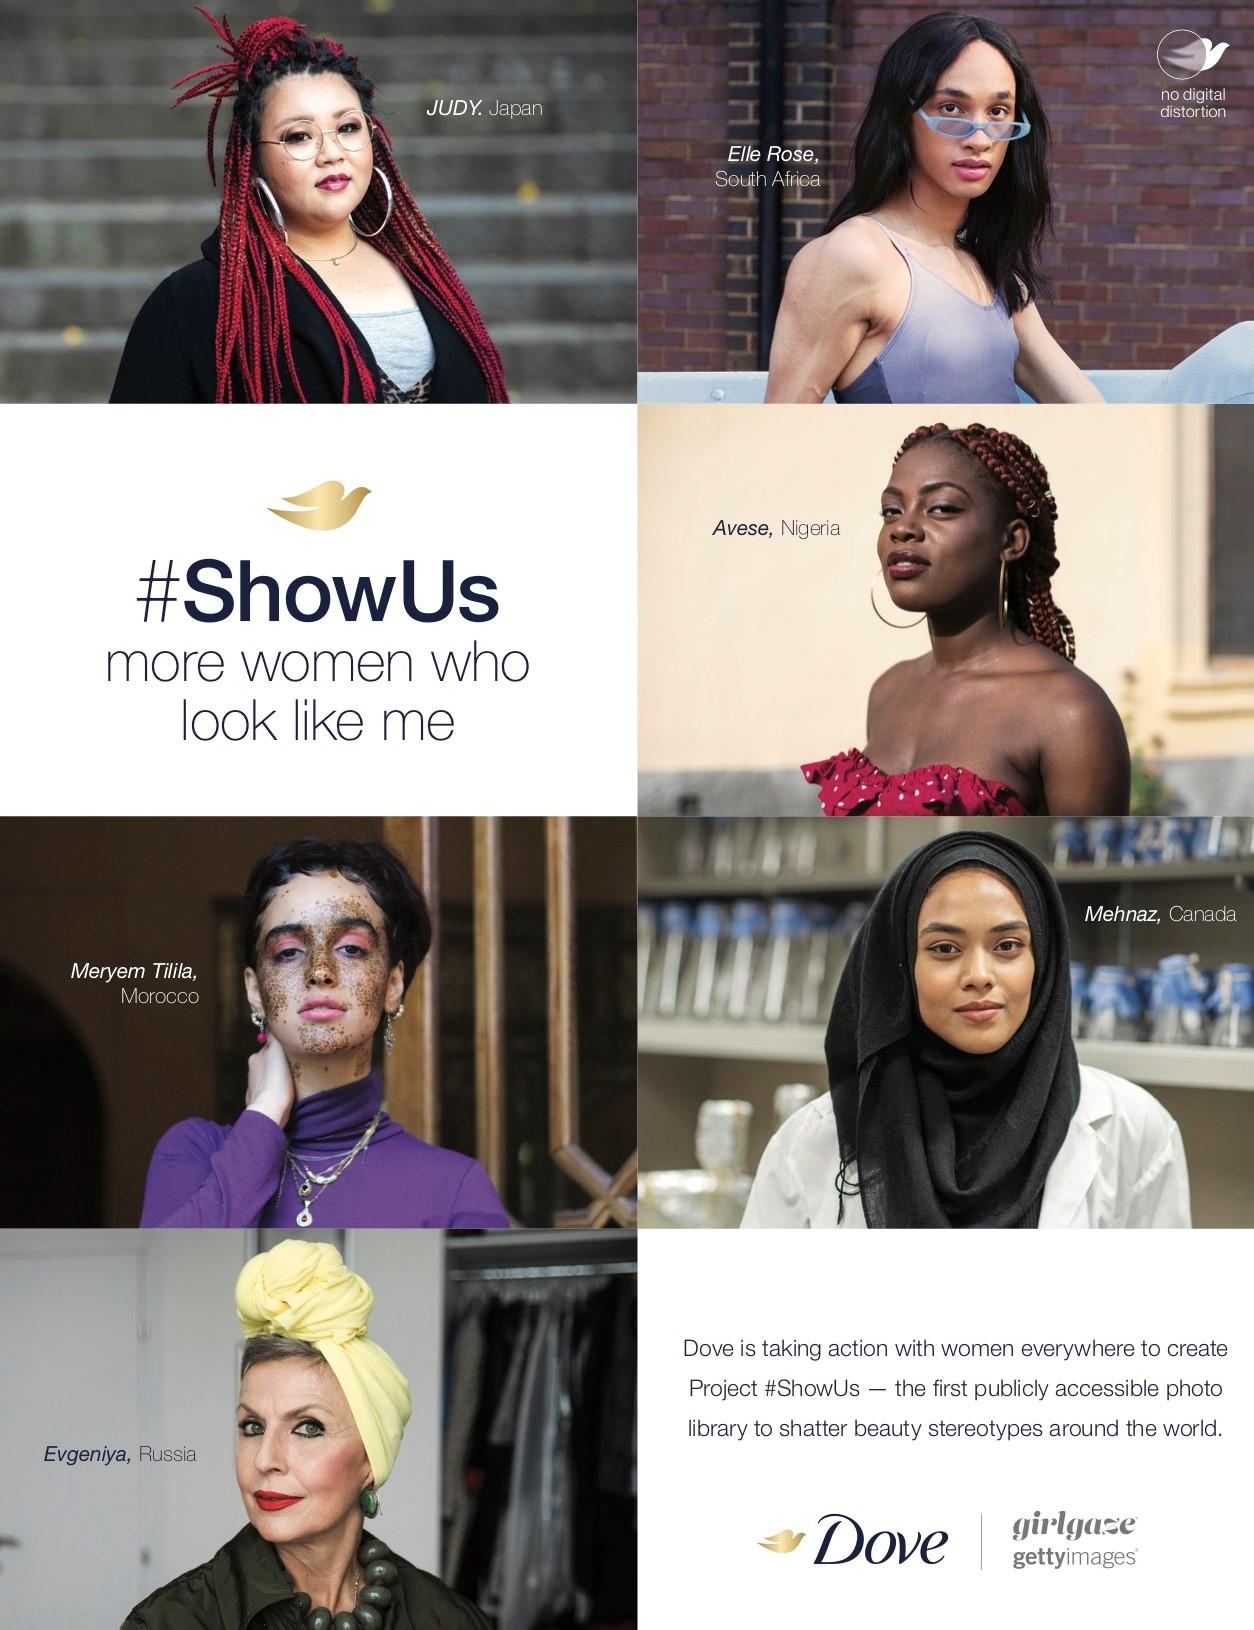 Dove Project #ShowUs key visual